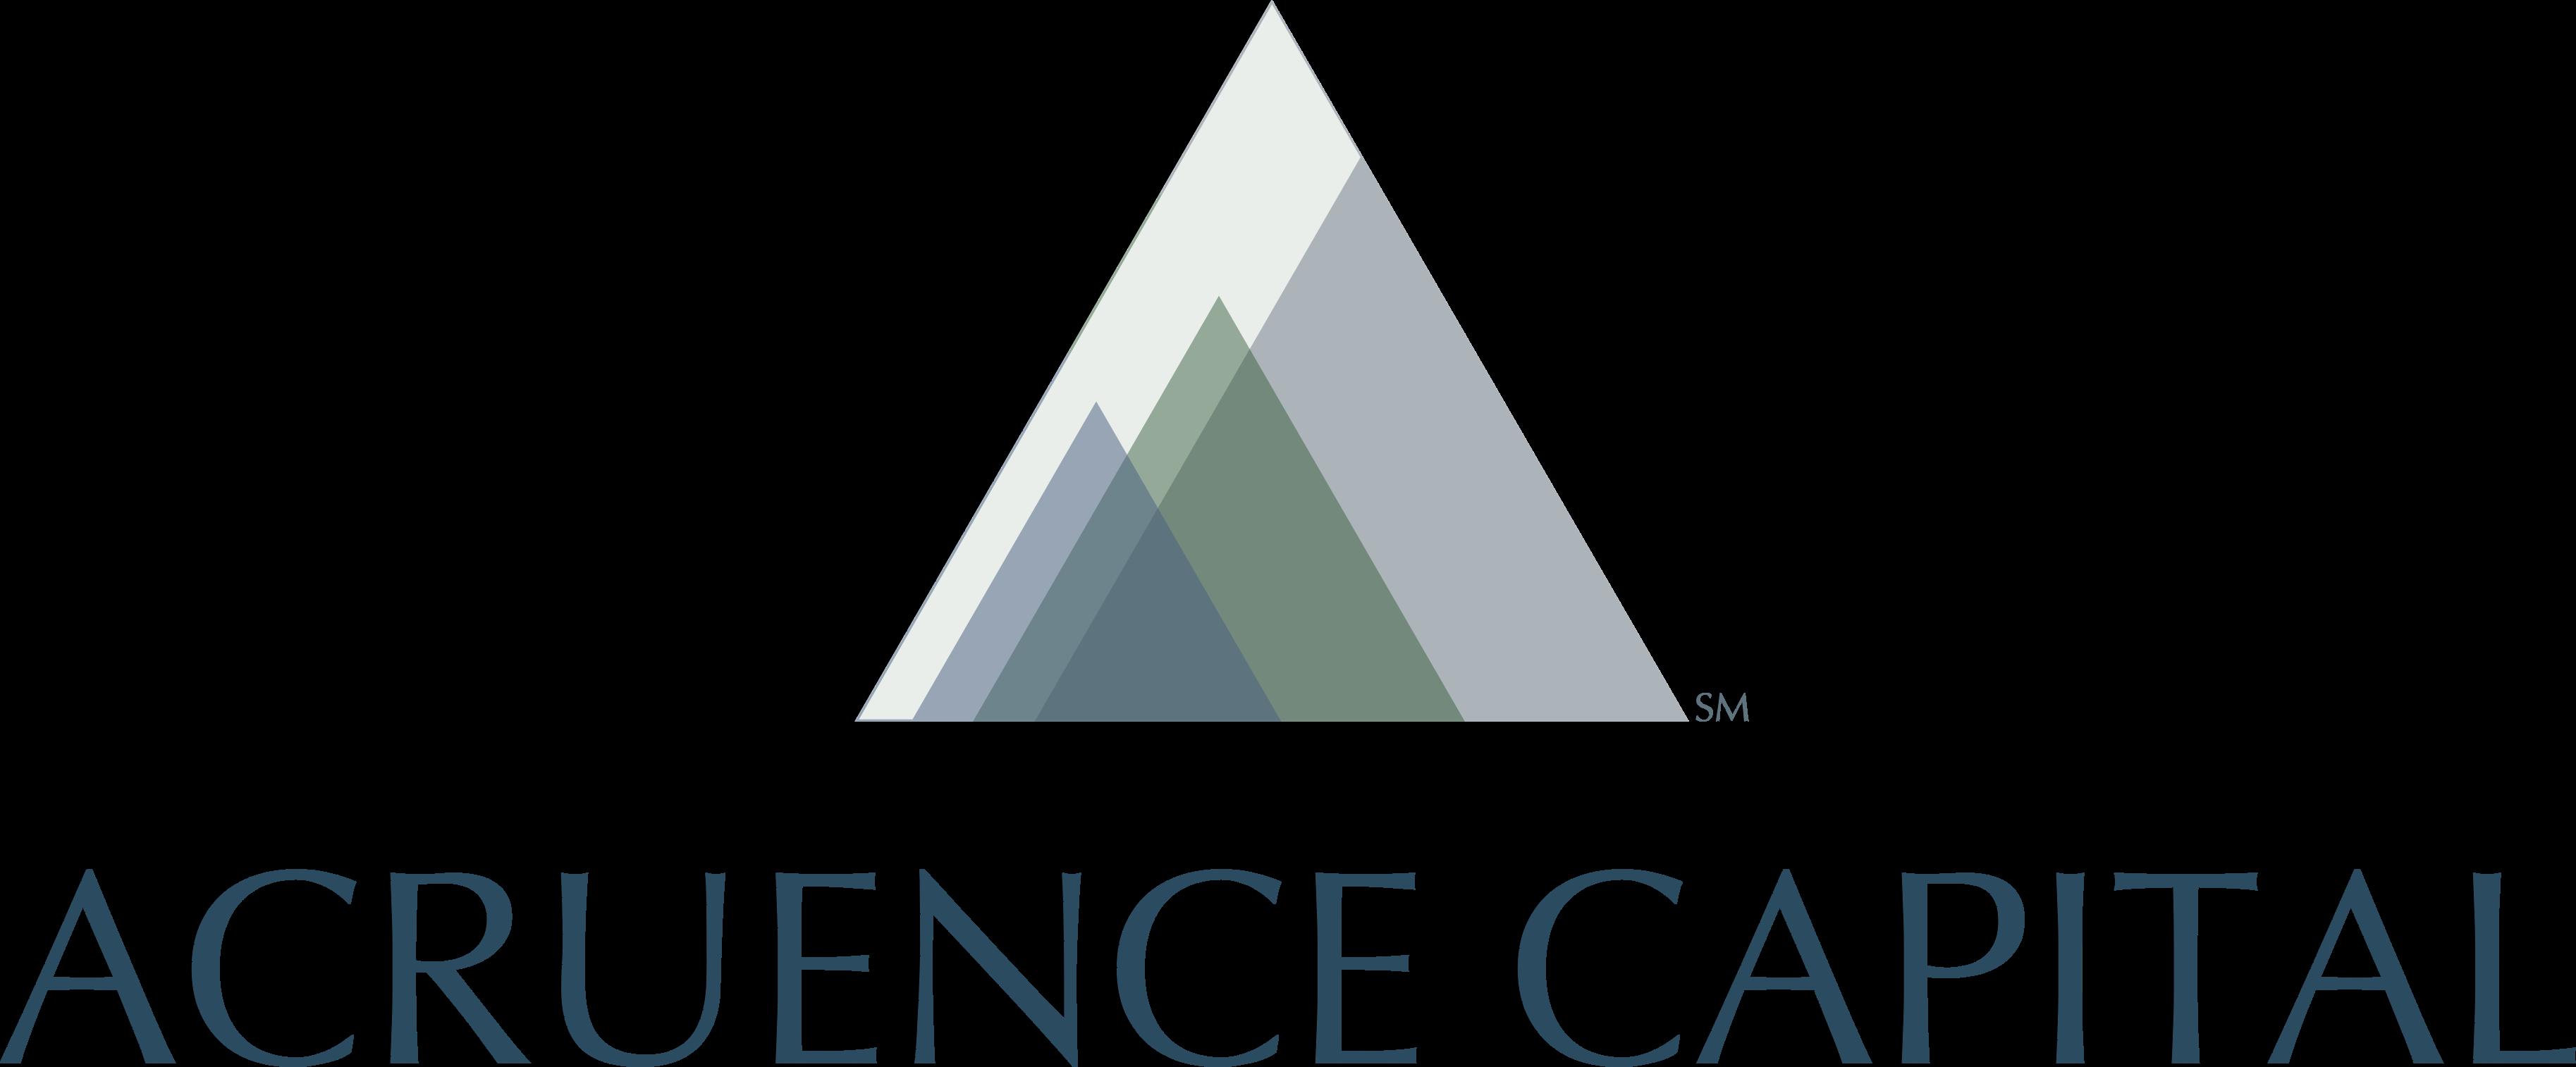 Acruence-Capital-Main-Logo